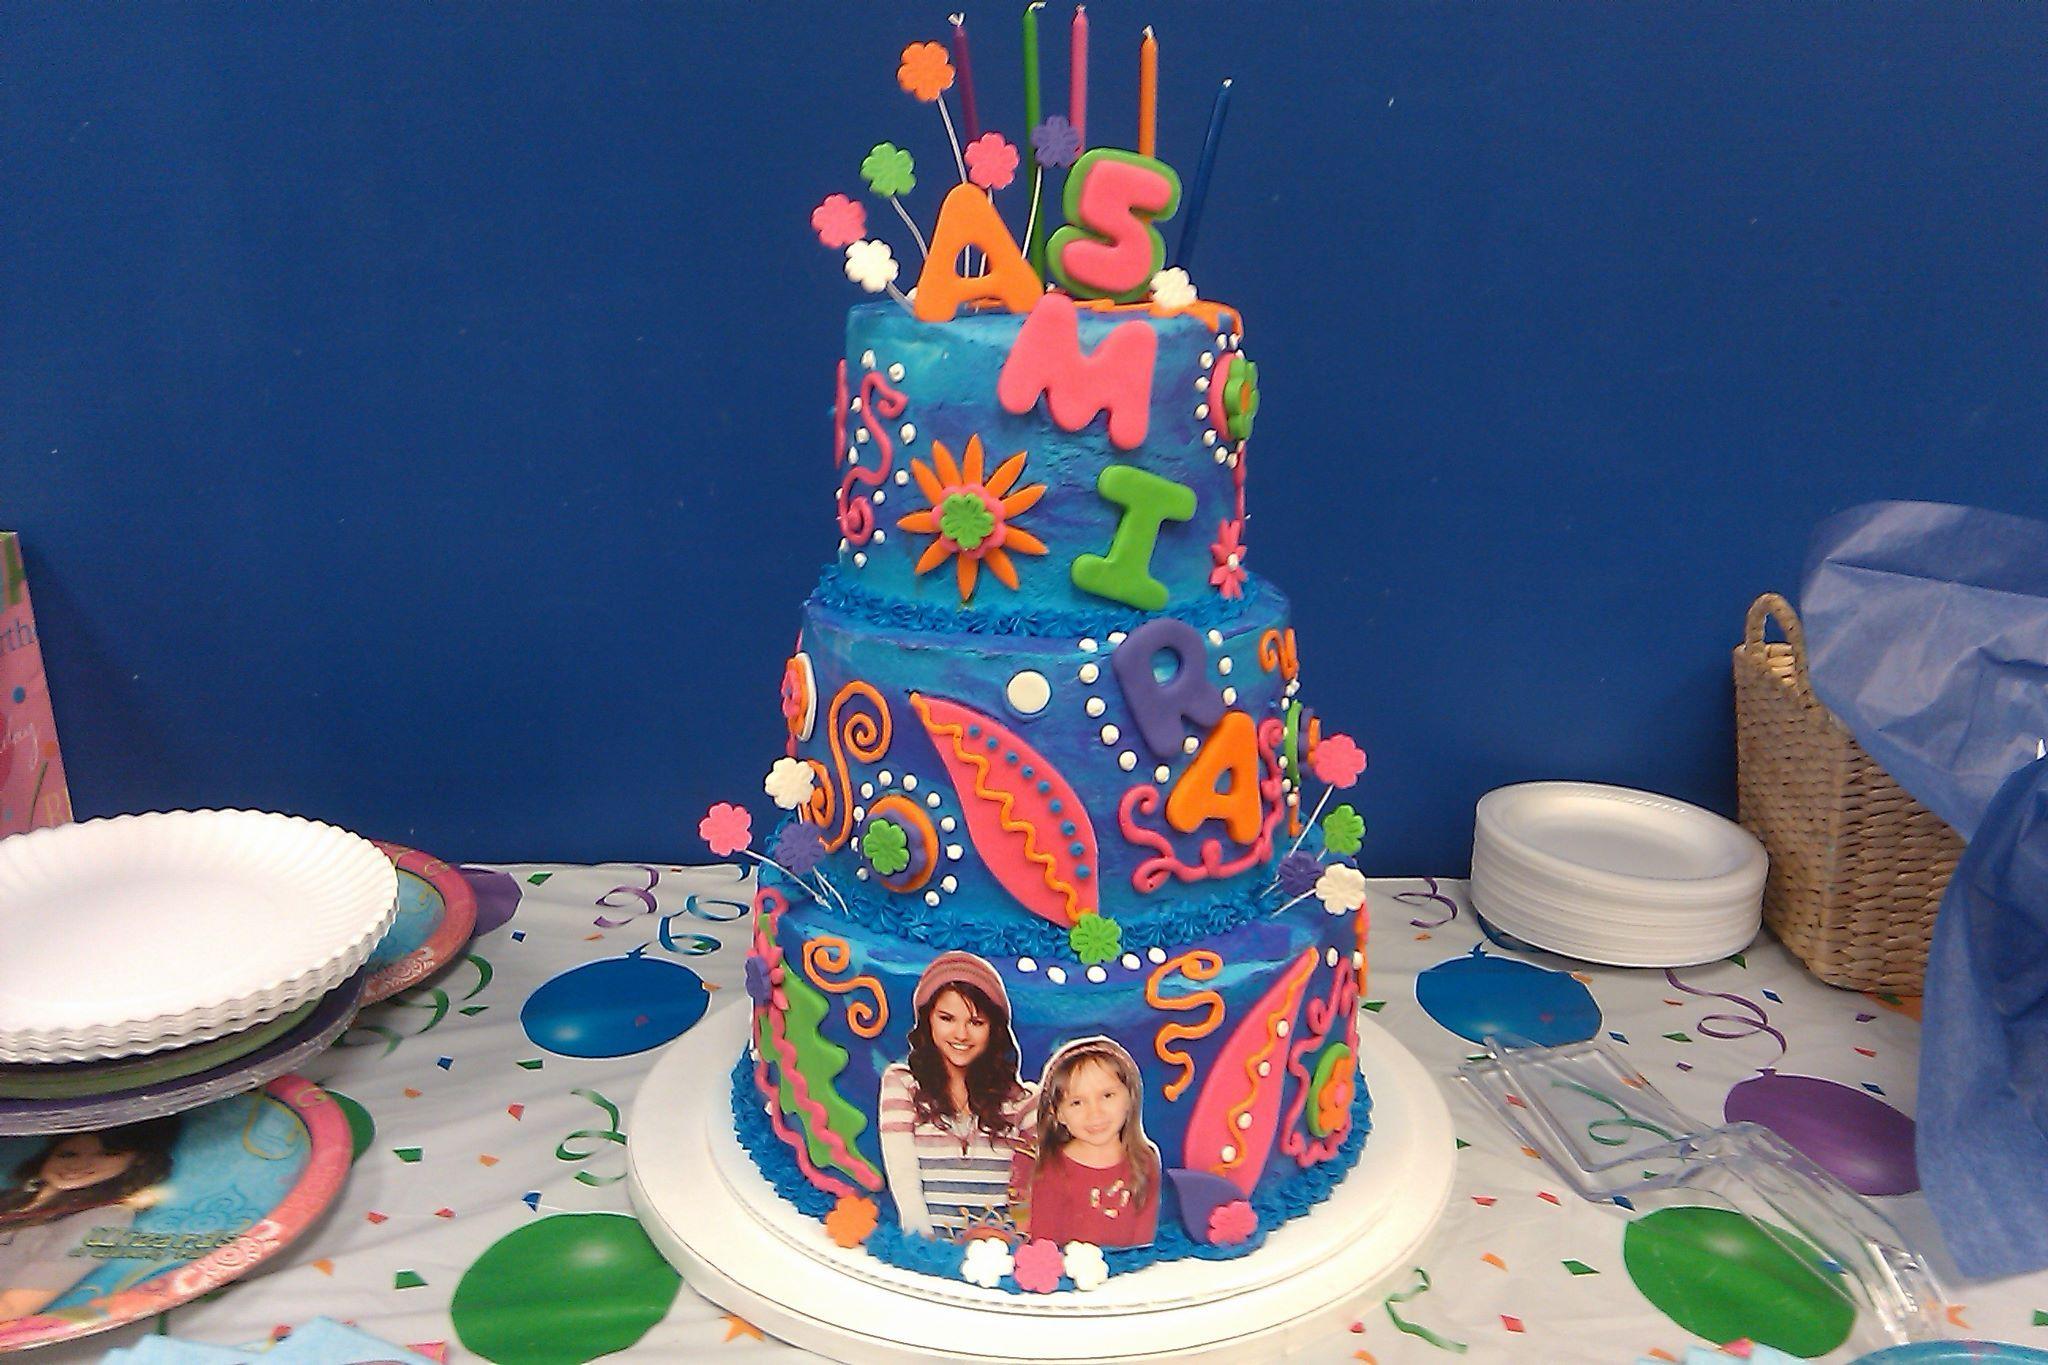 Amira S 5th Birthday Cake Wizards Of Waverly Place 5th Birthday Cake Cake Birthday Cake